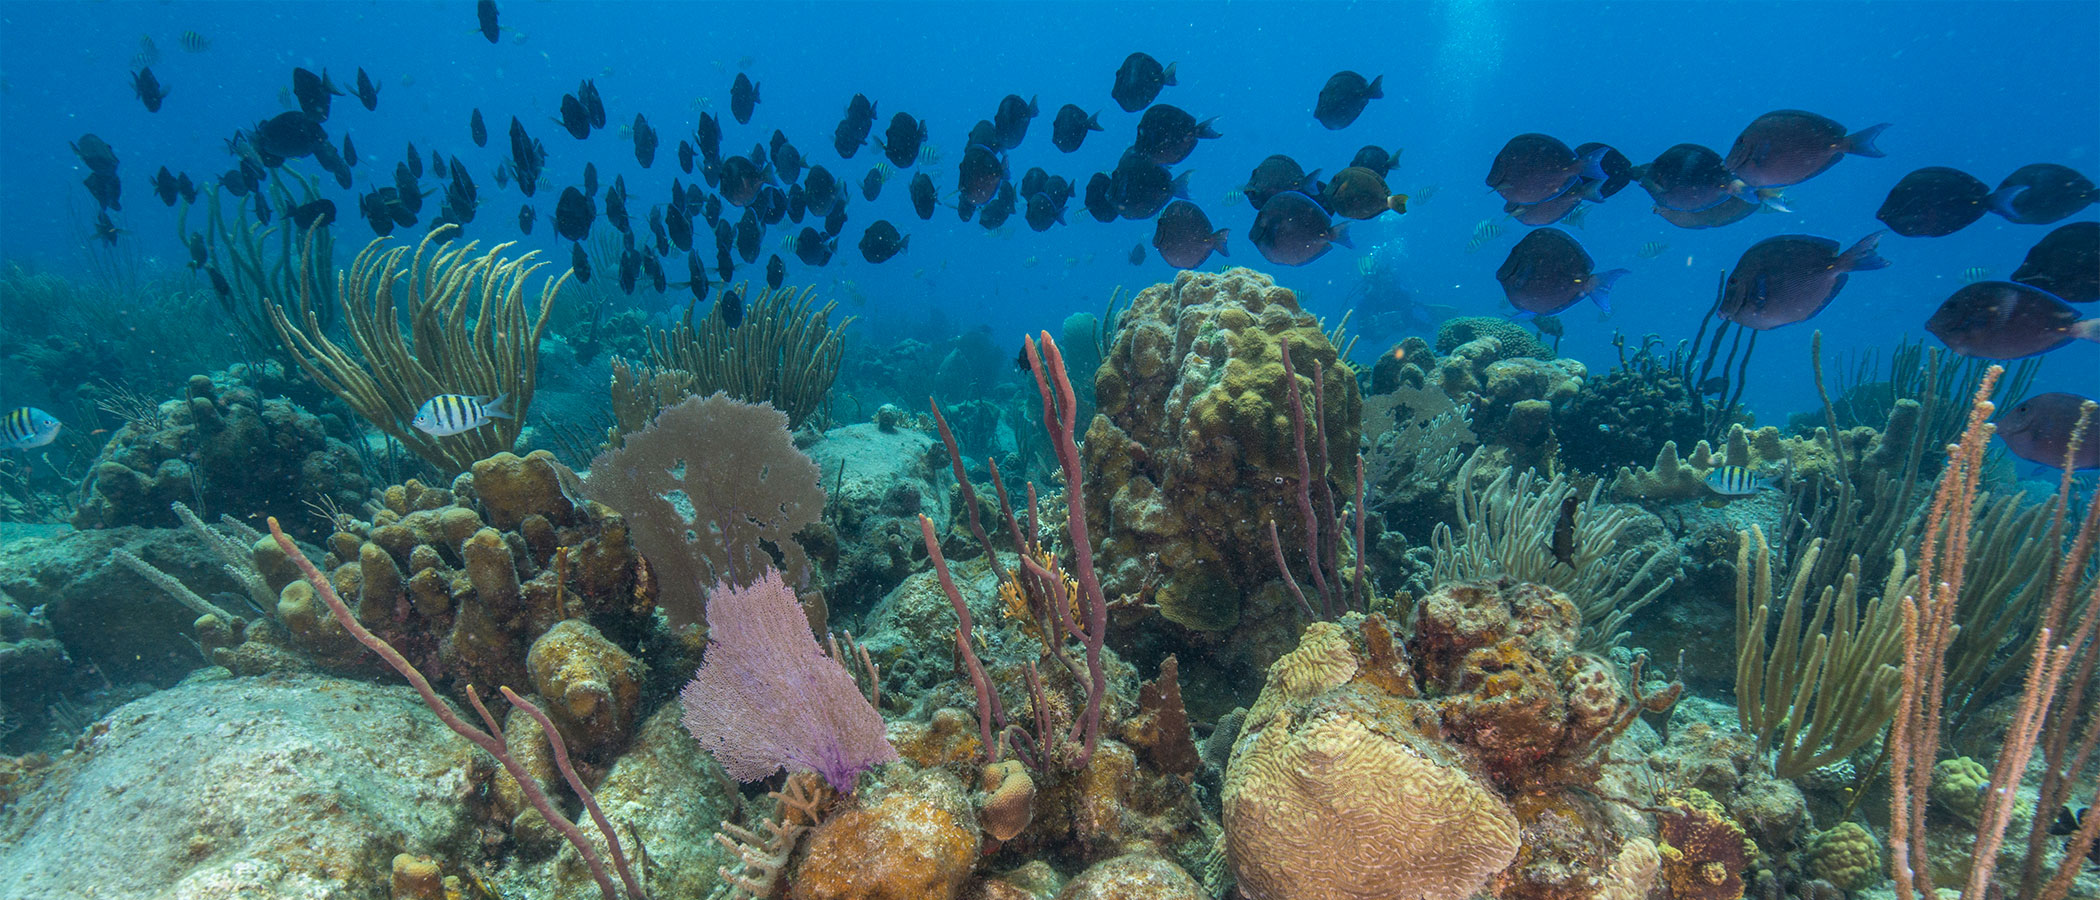 Underwater view of coral reefs